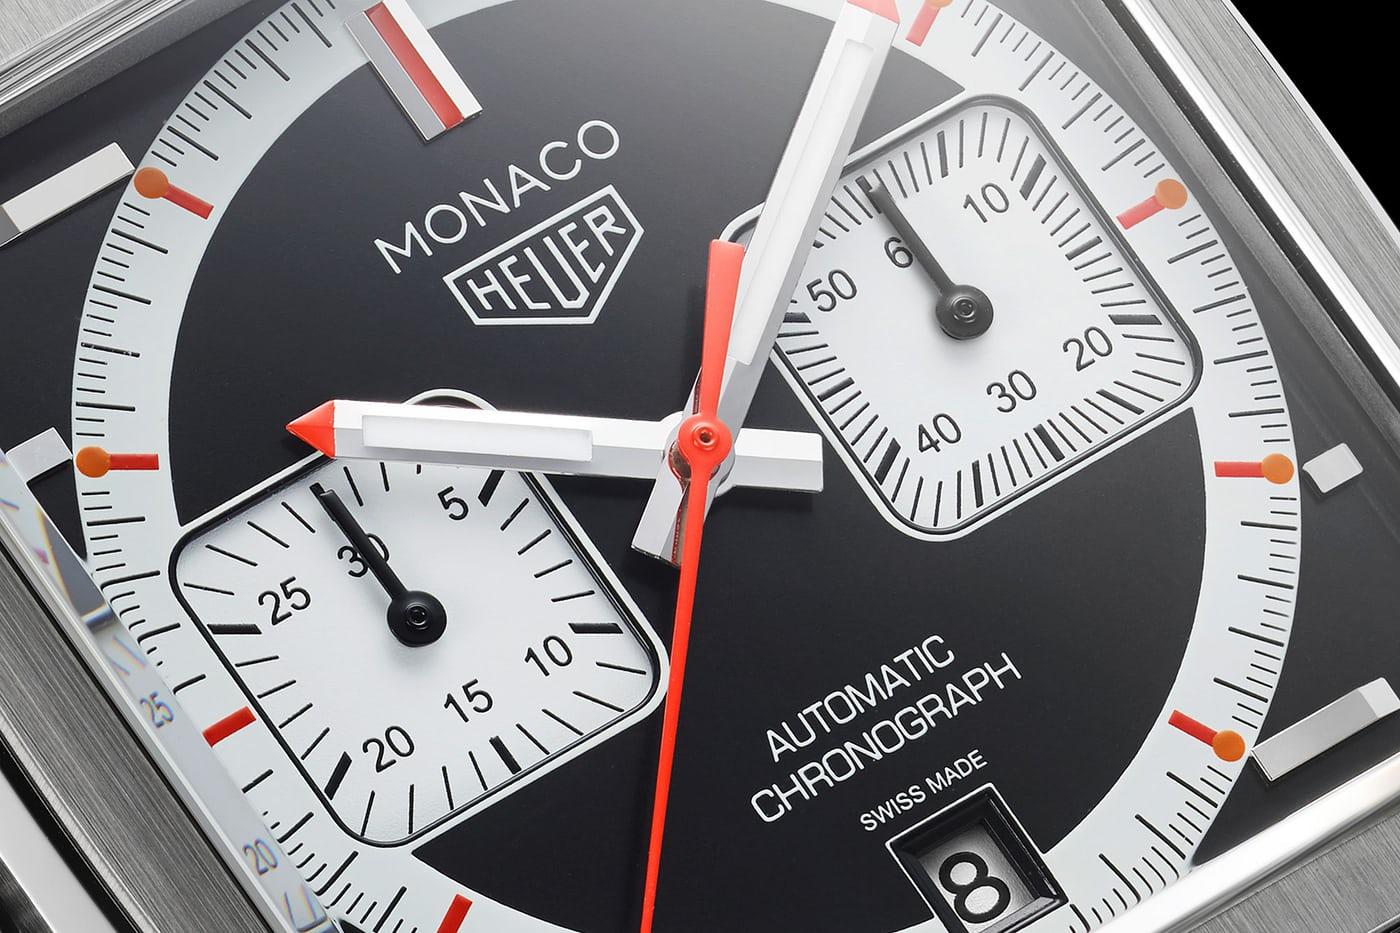 Tag Heuer horloge Monaco 4th Limited Edition 1999-2009 series - close up wijzerplaat